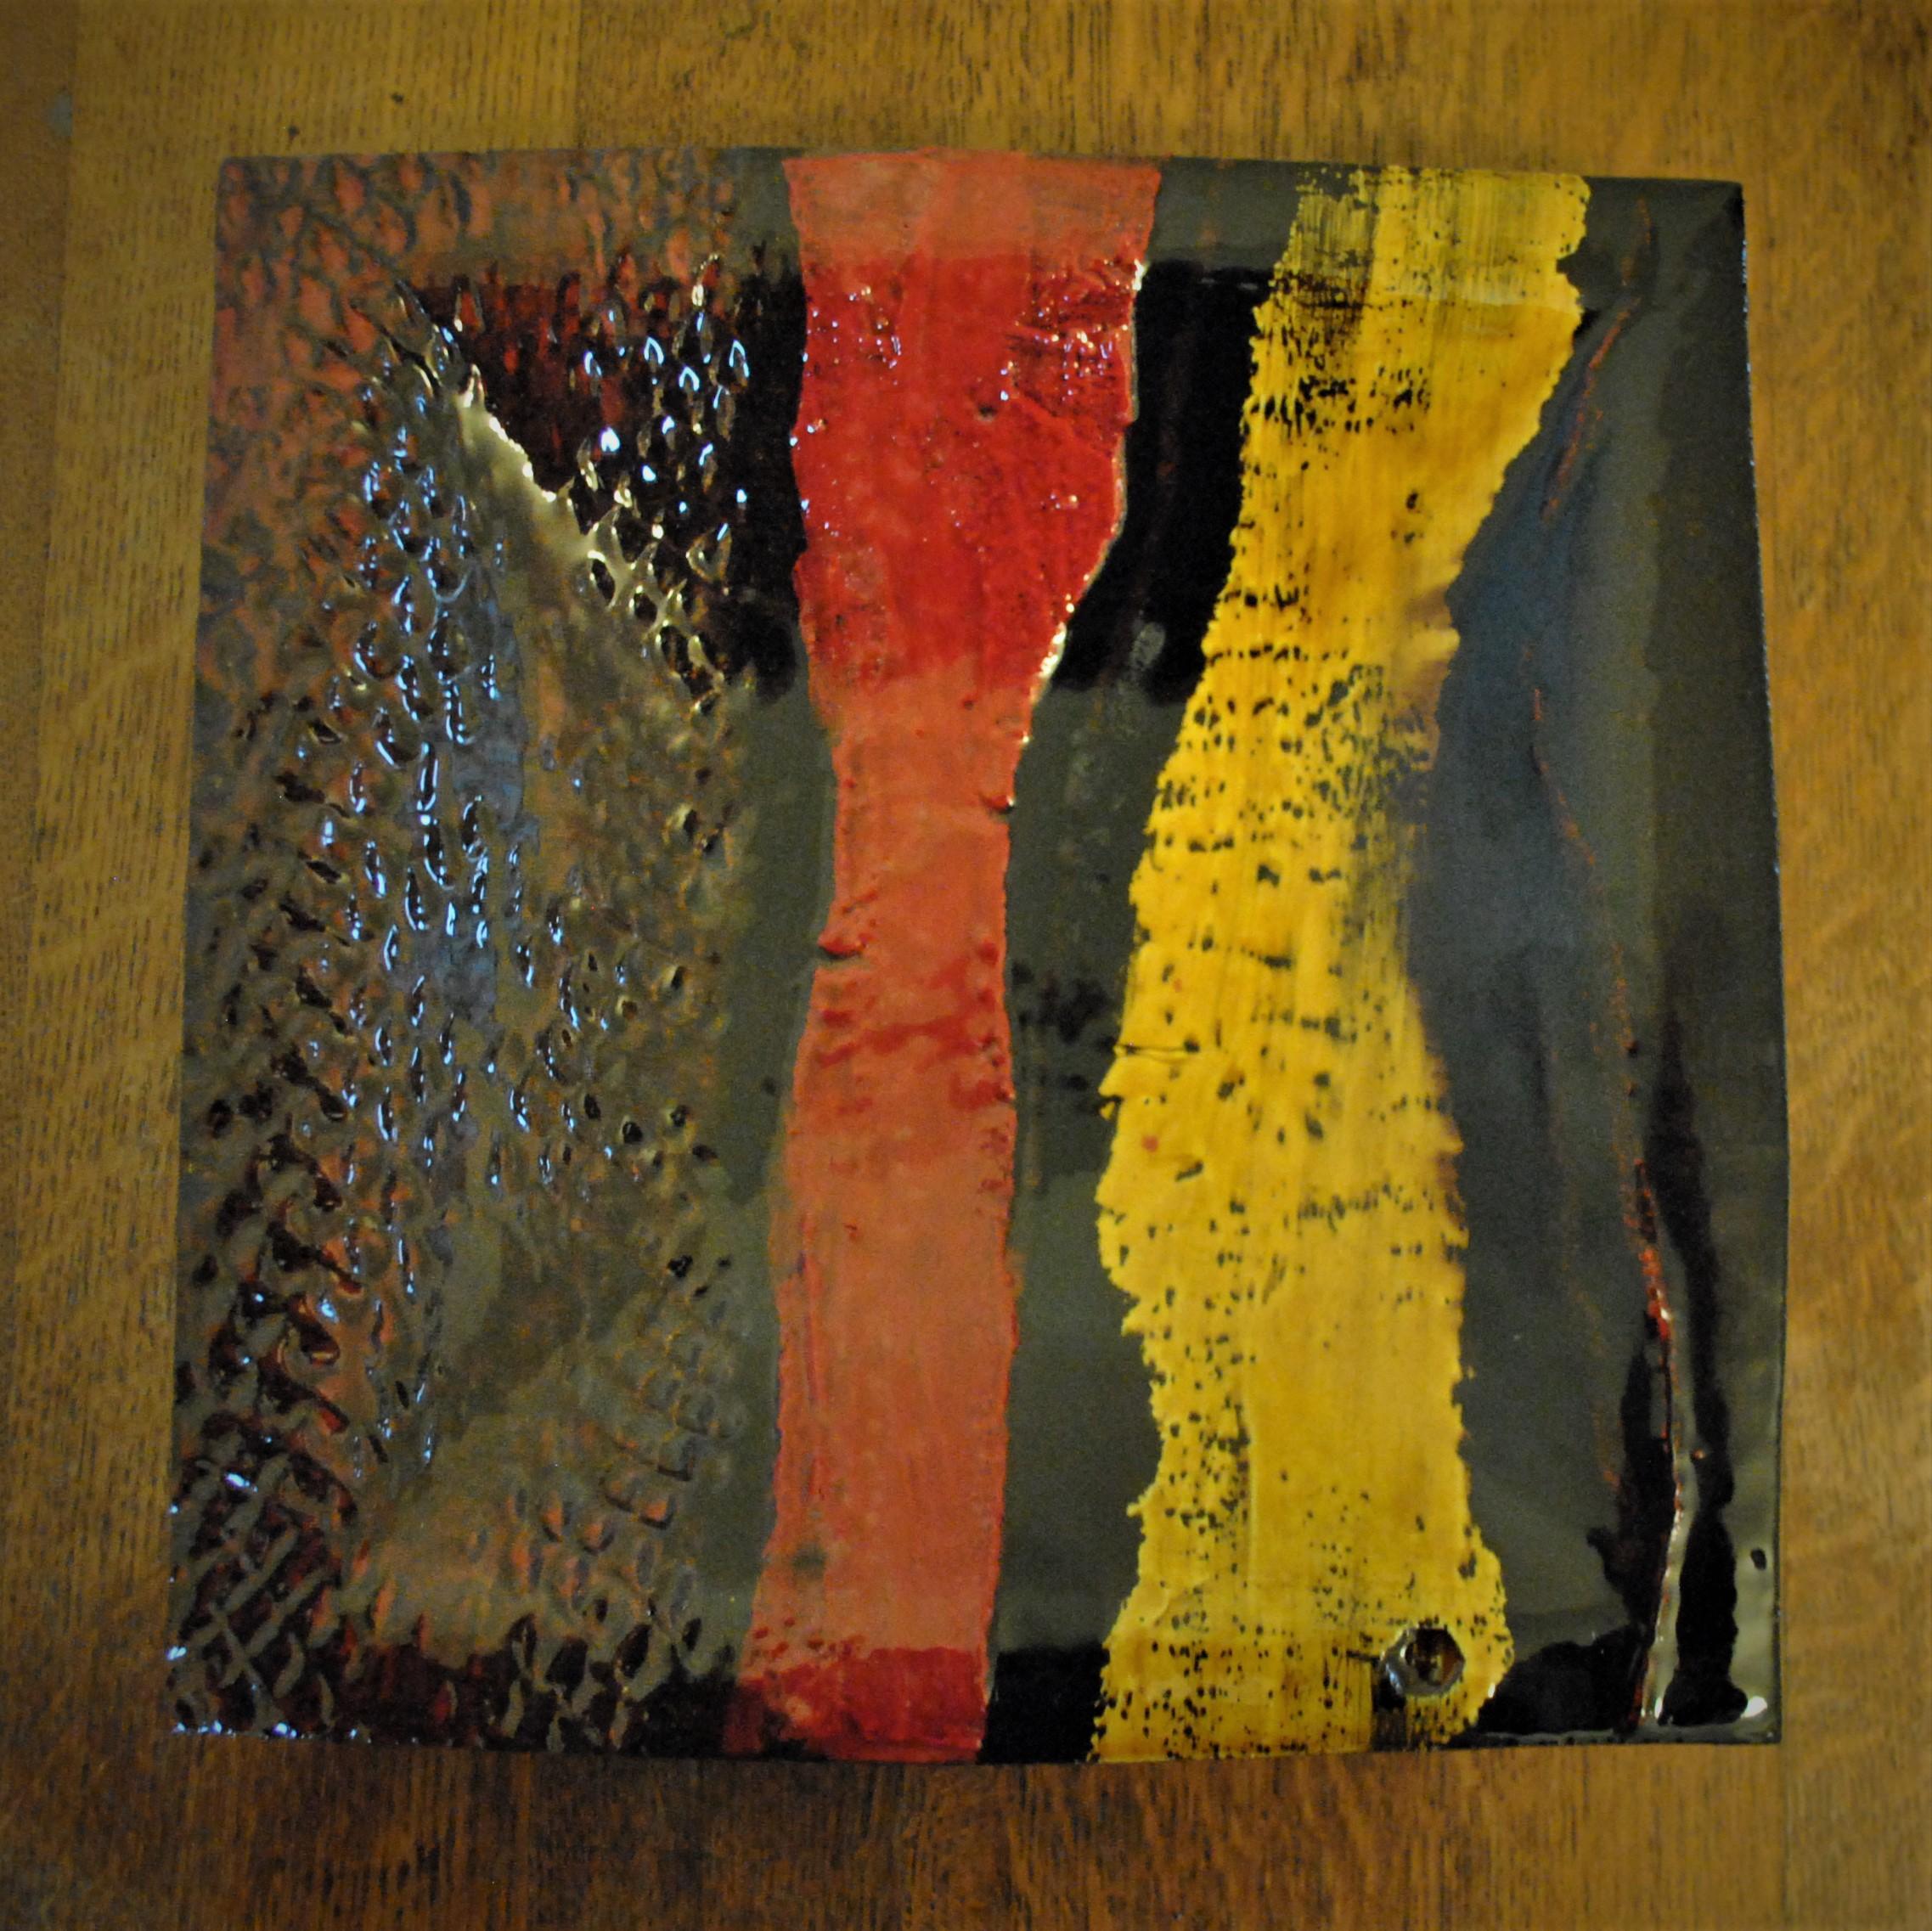 Boundaries red & yellow (2018) Dave Harper